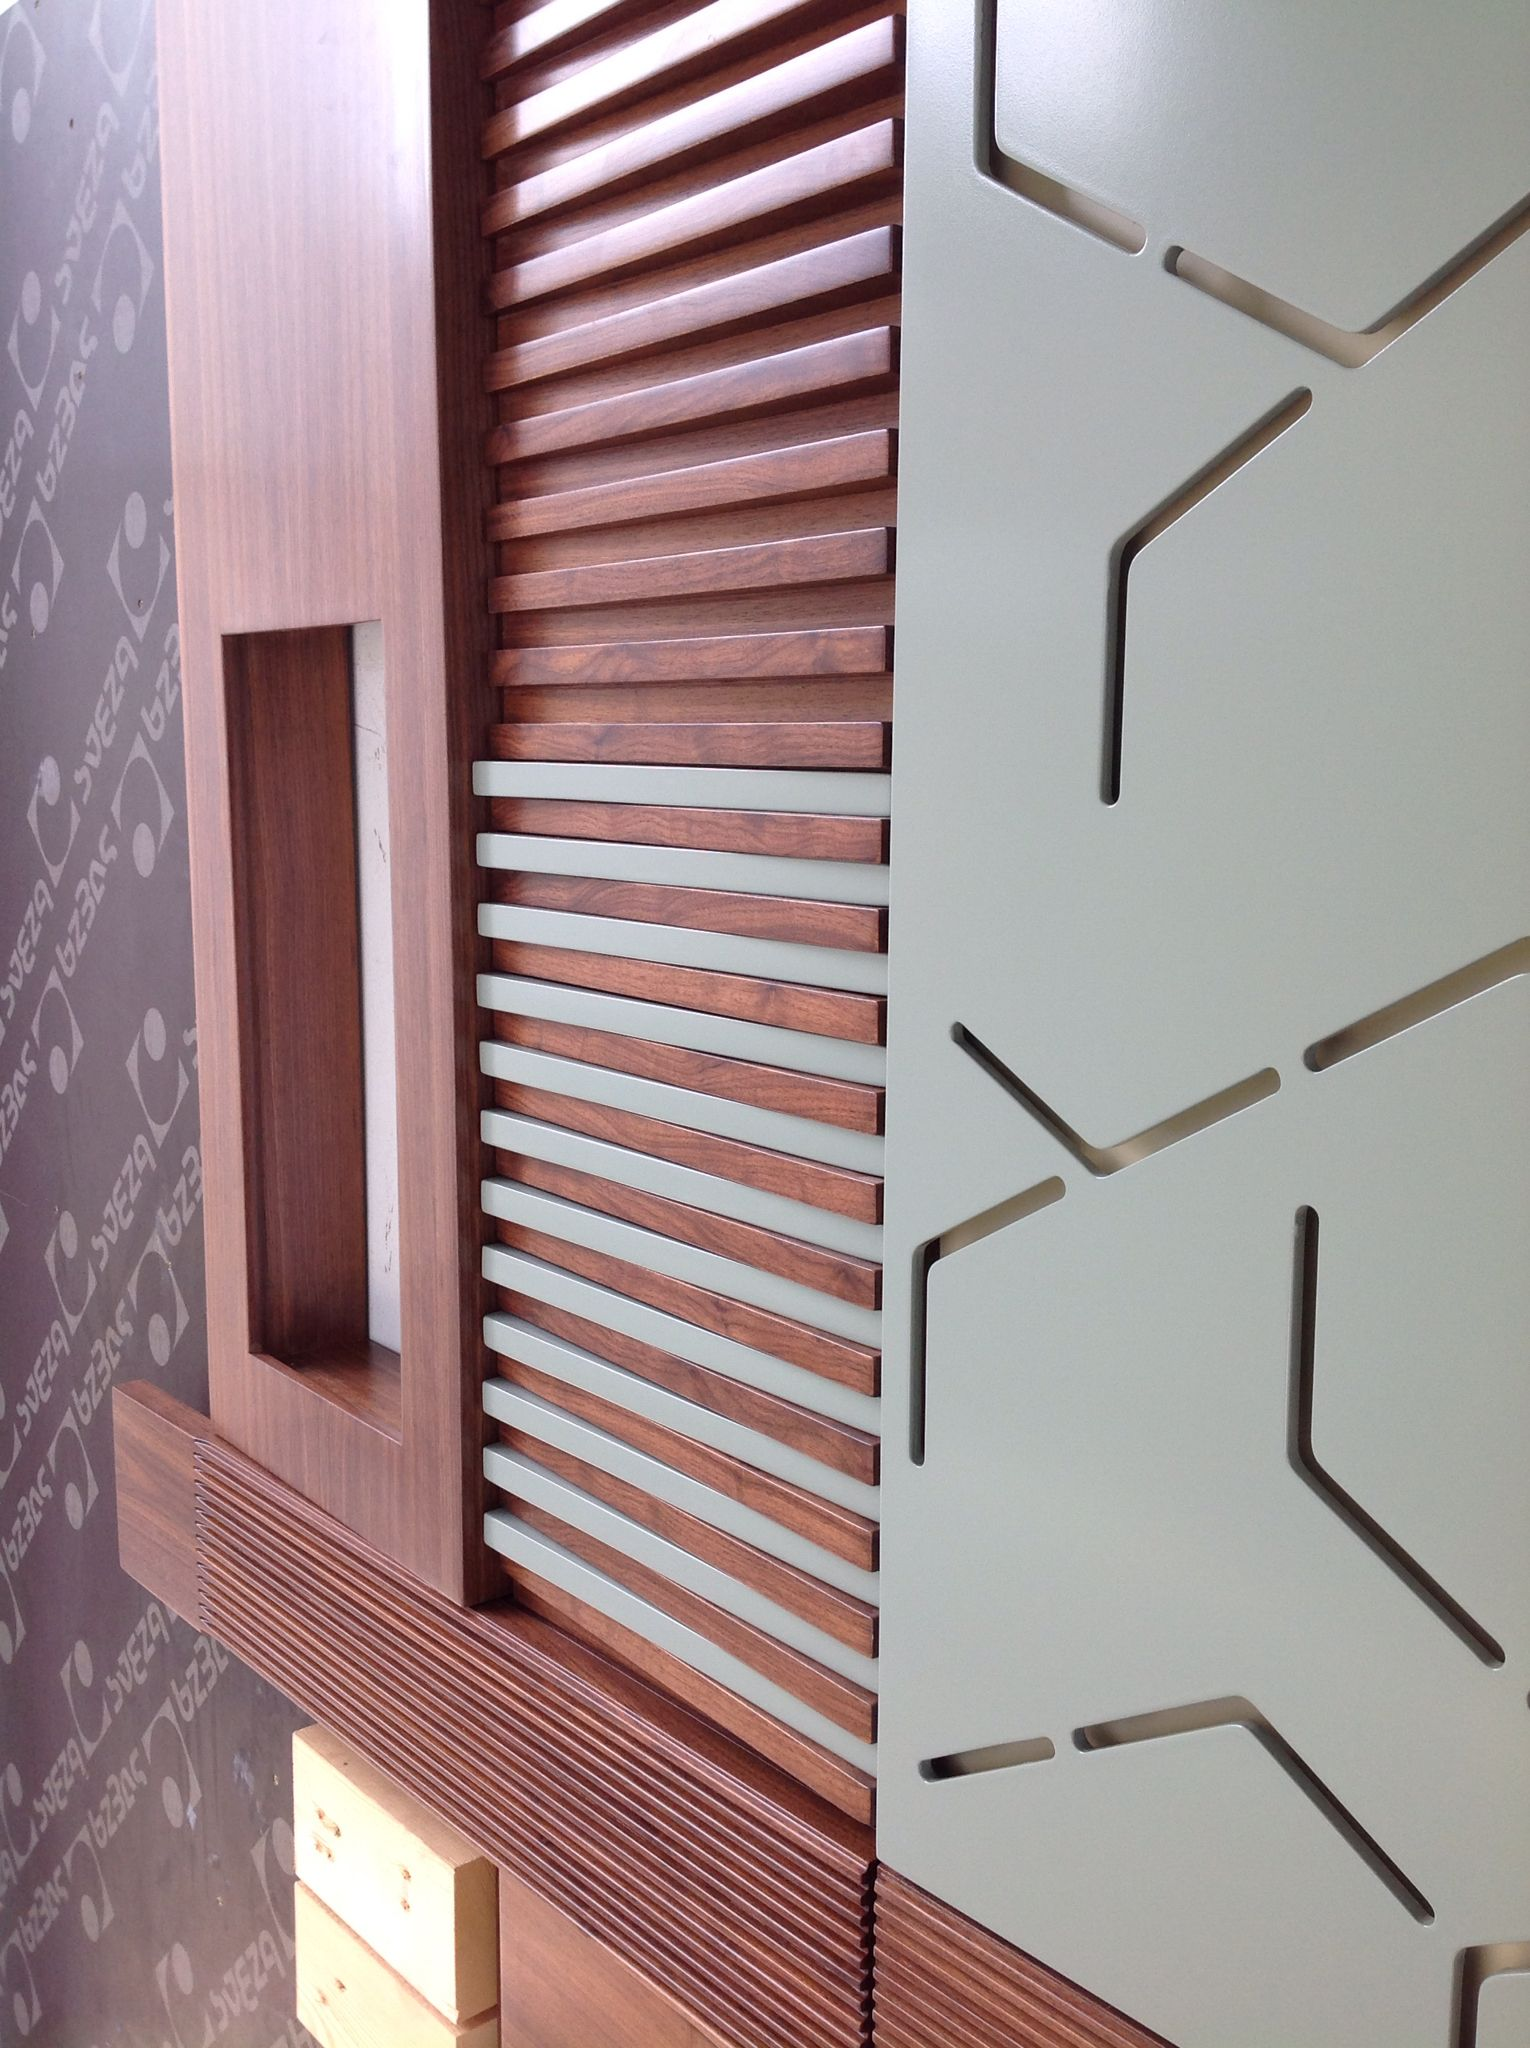 Entrance Door | MY CV (My Works). | Pinterest | Entrance doors